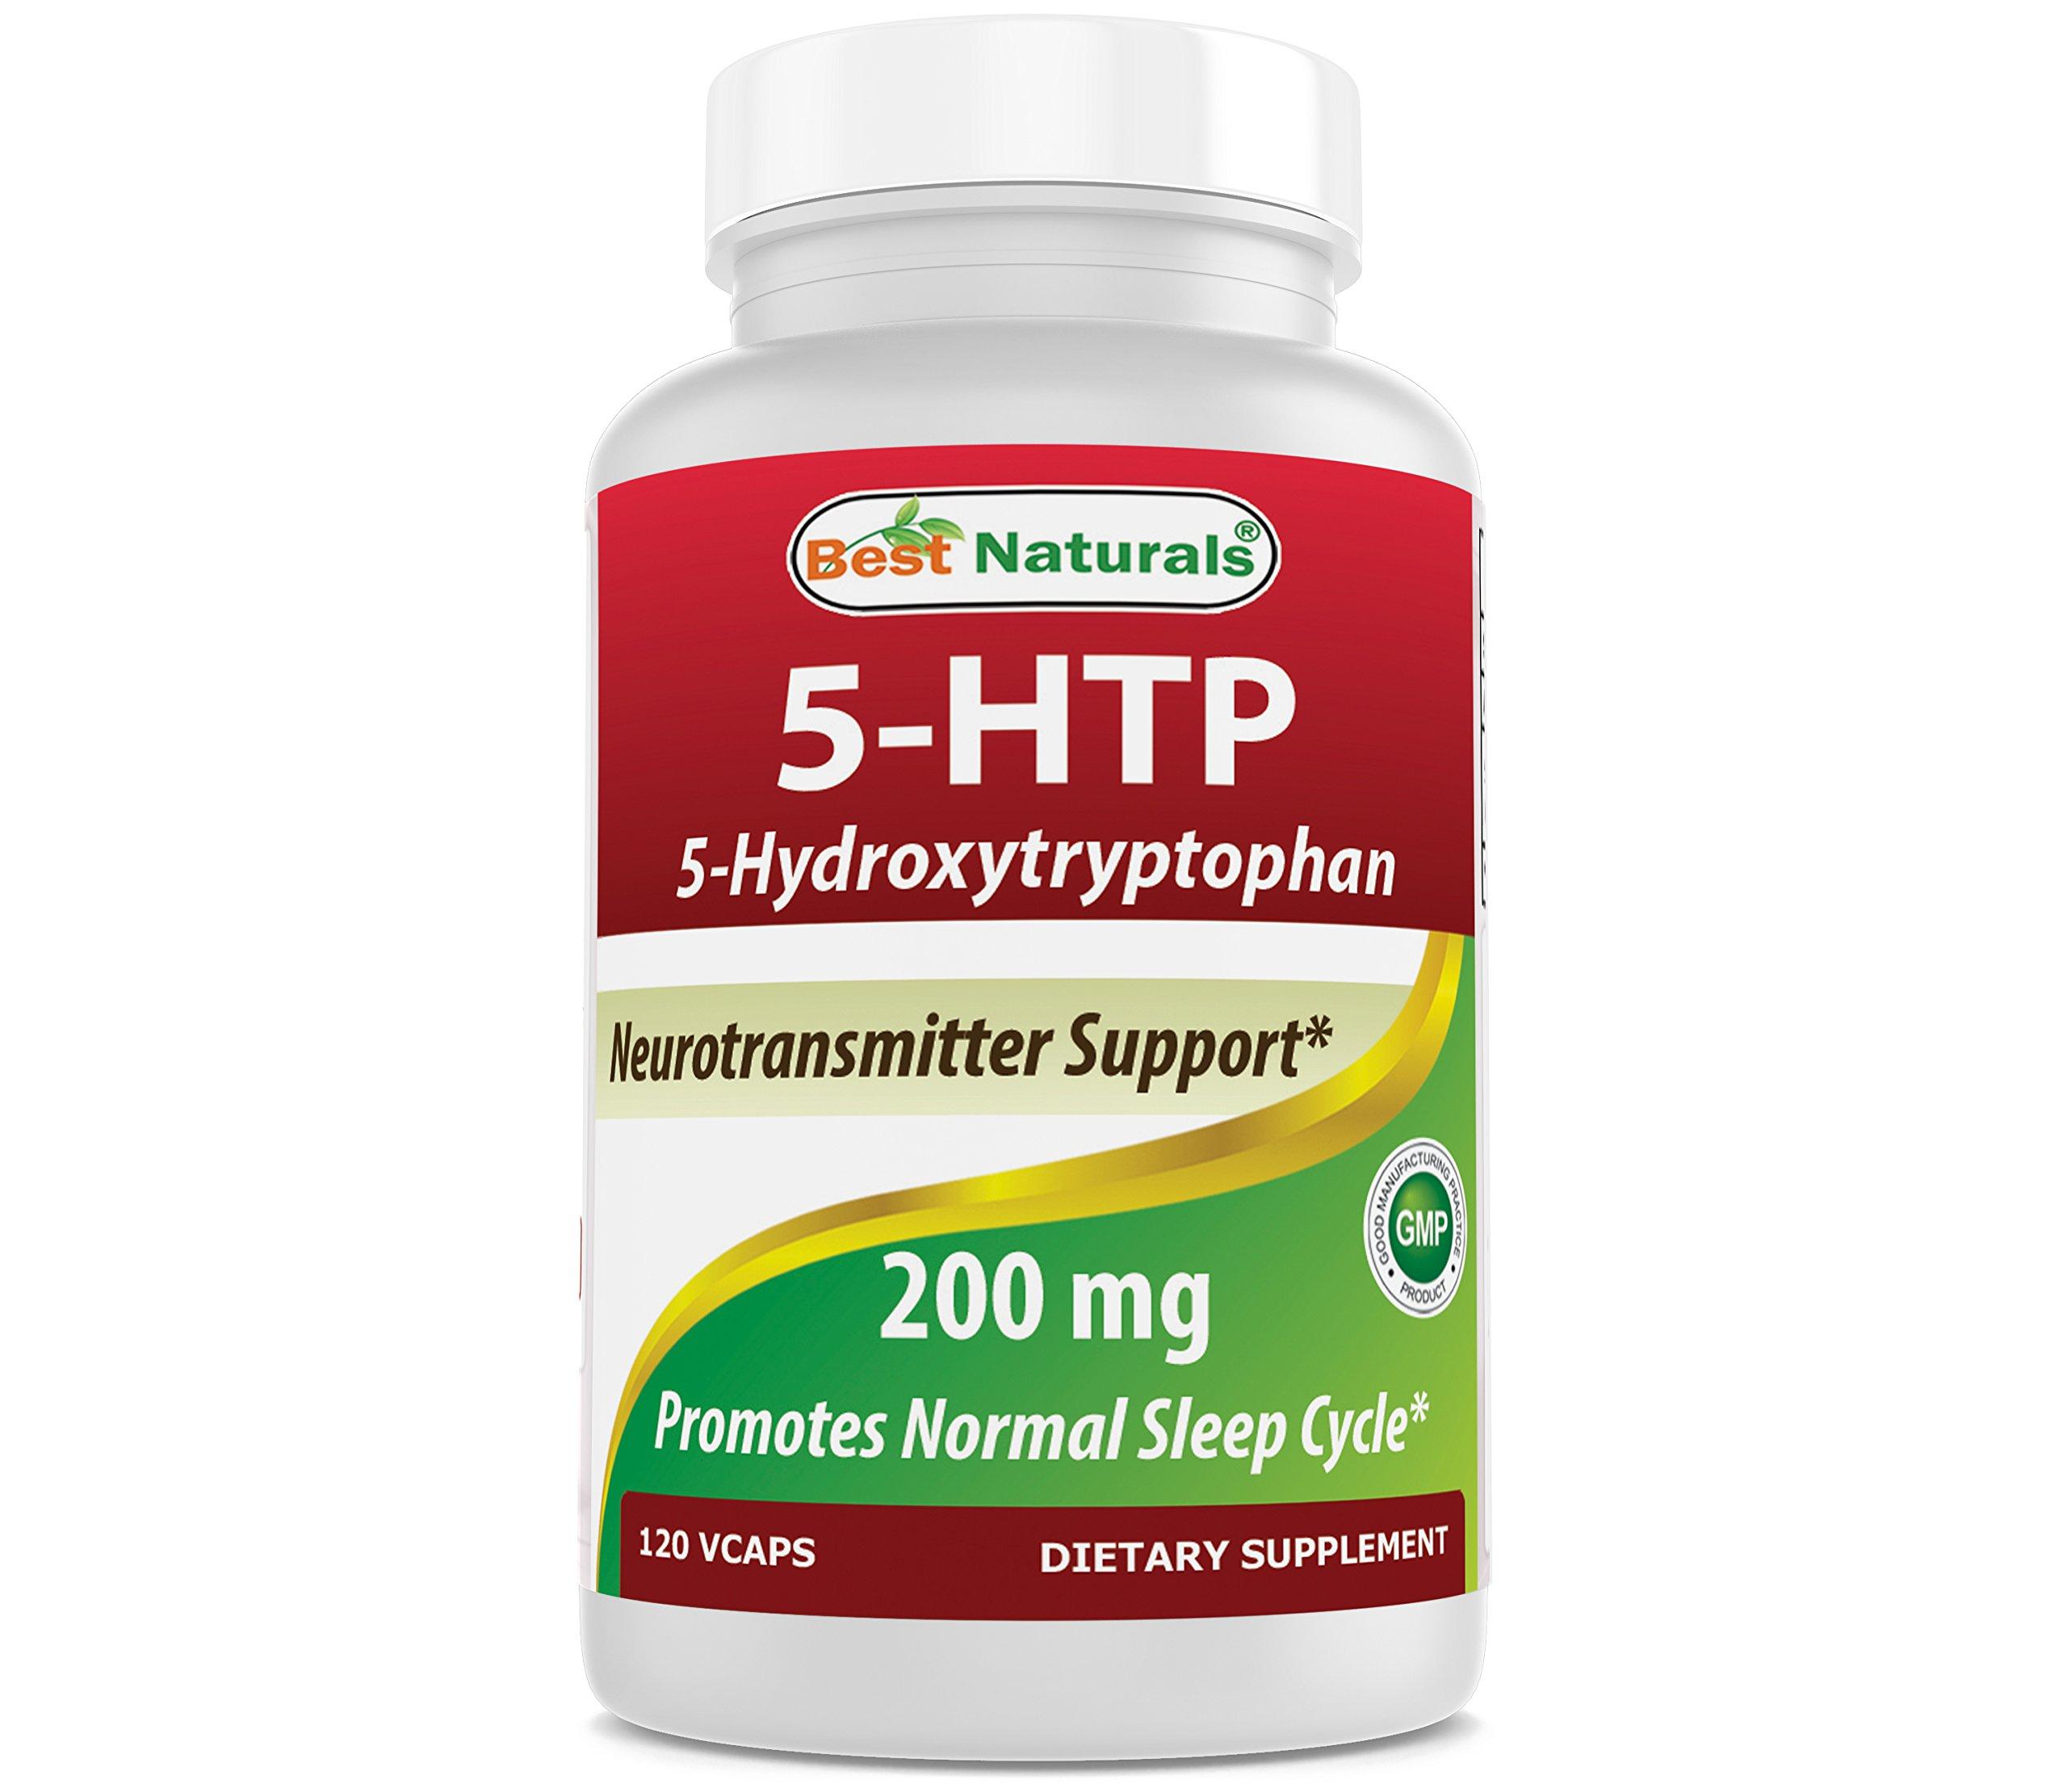 Best Naturals 5-HTP 200 mg 120 Veggie Capsules